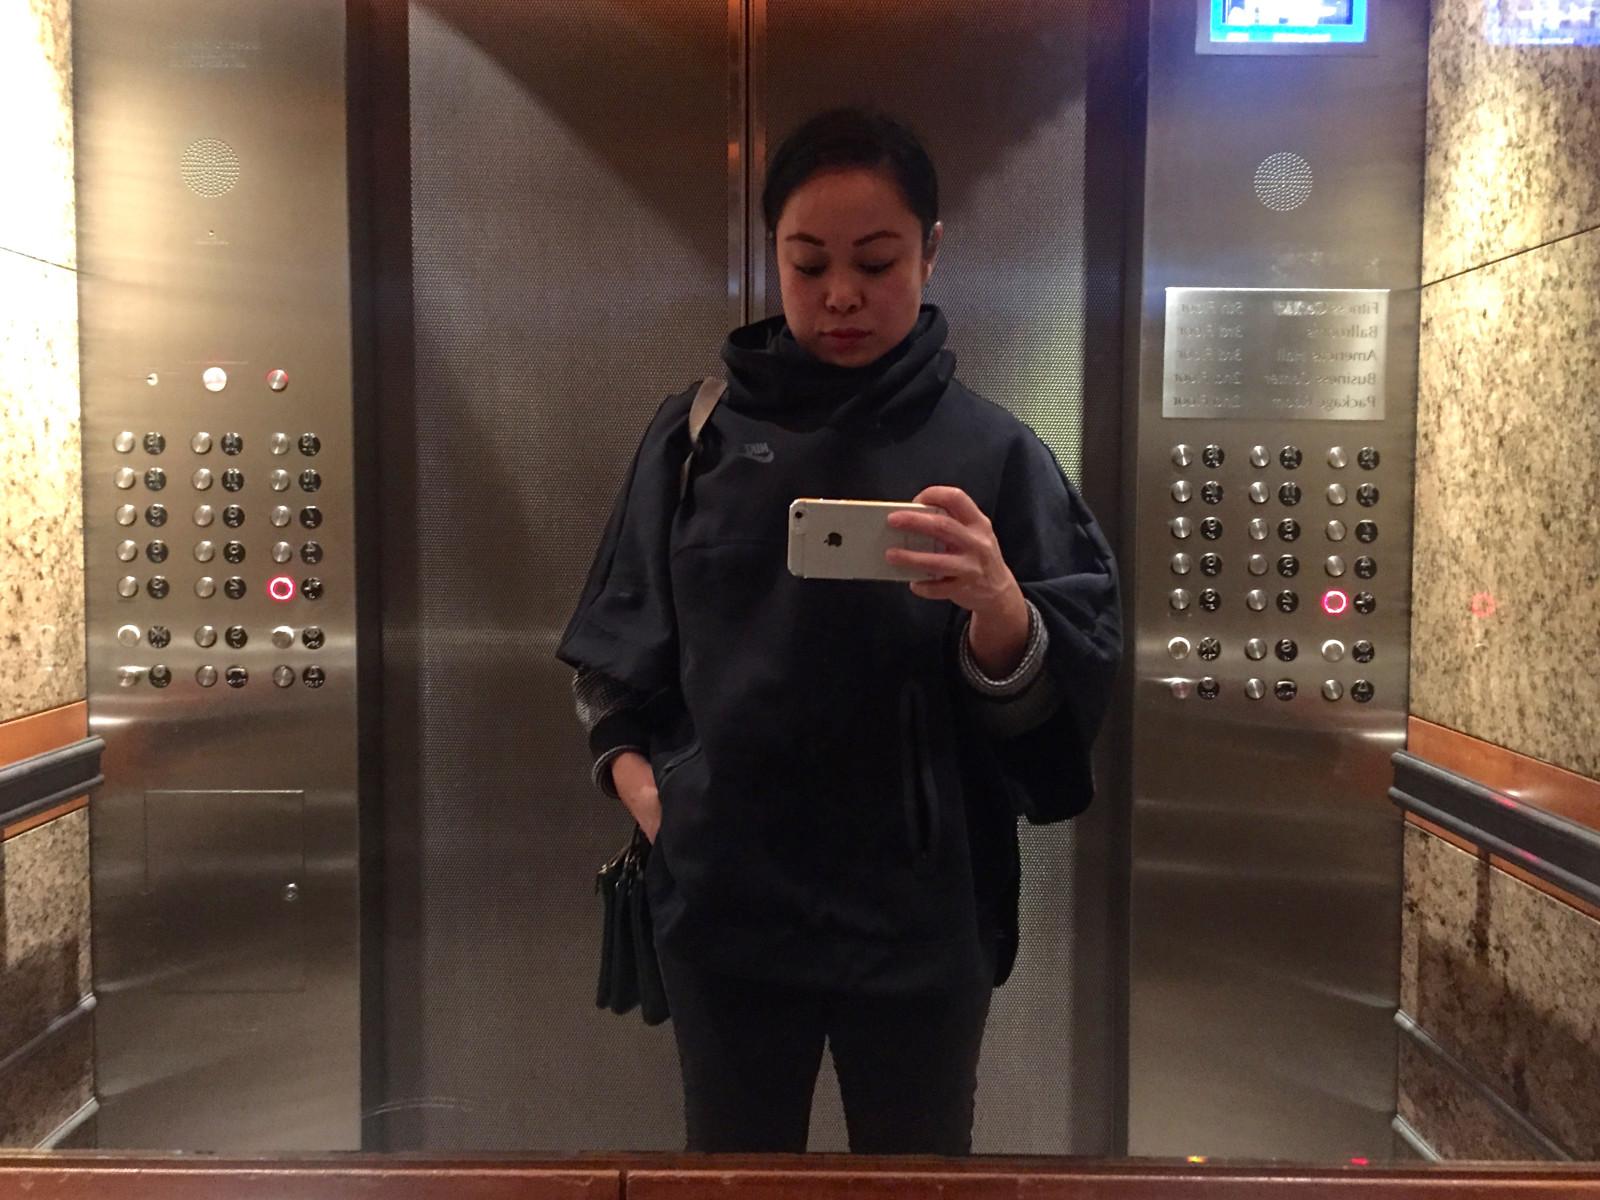 NYC Elevator Selfie | www.rtwgirl.com